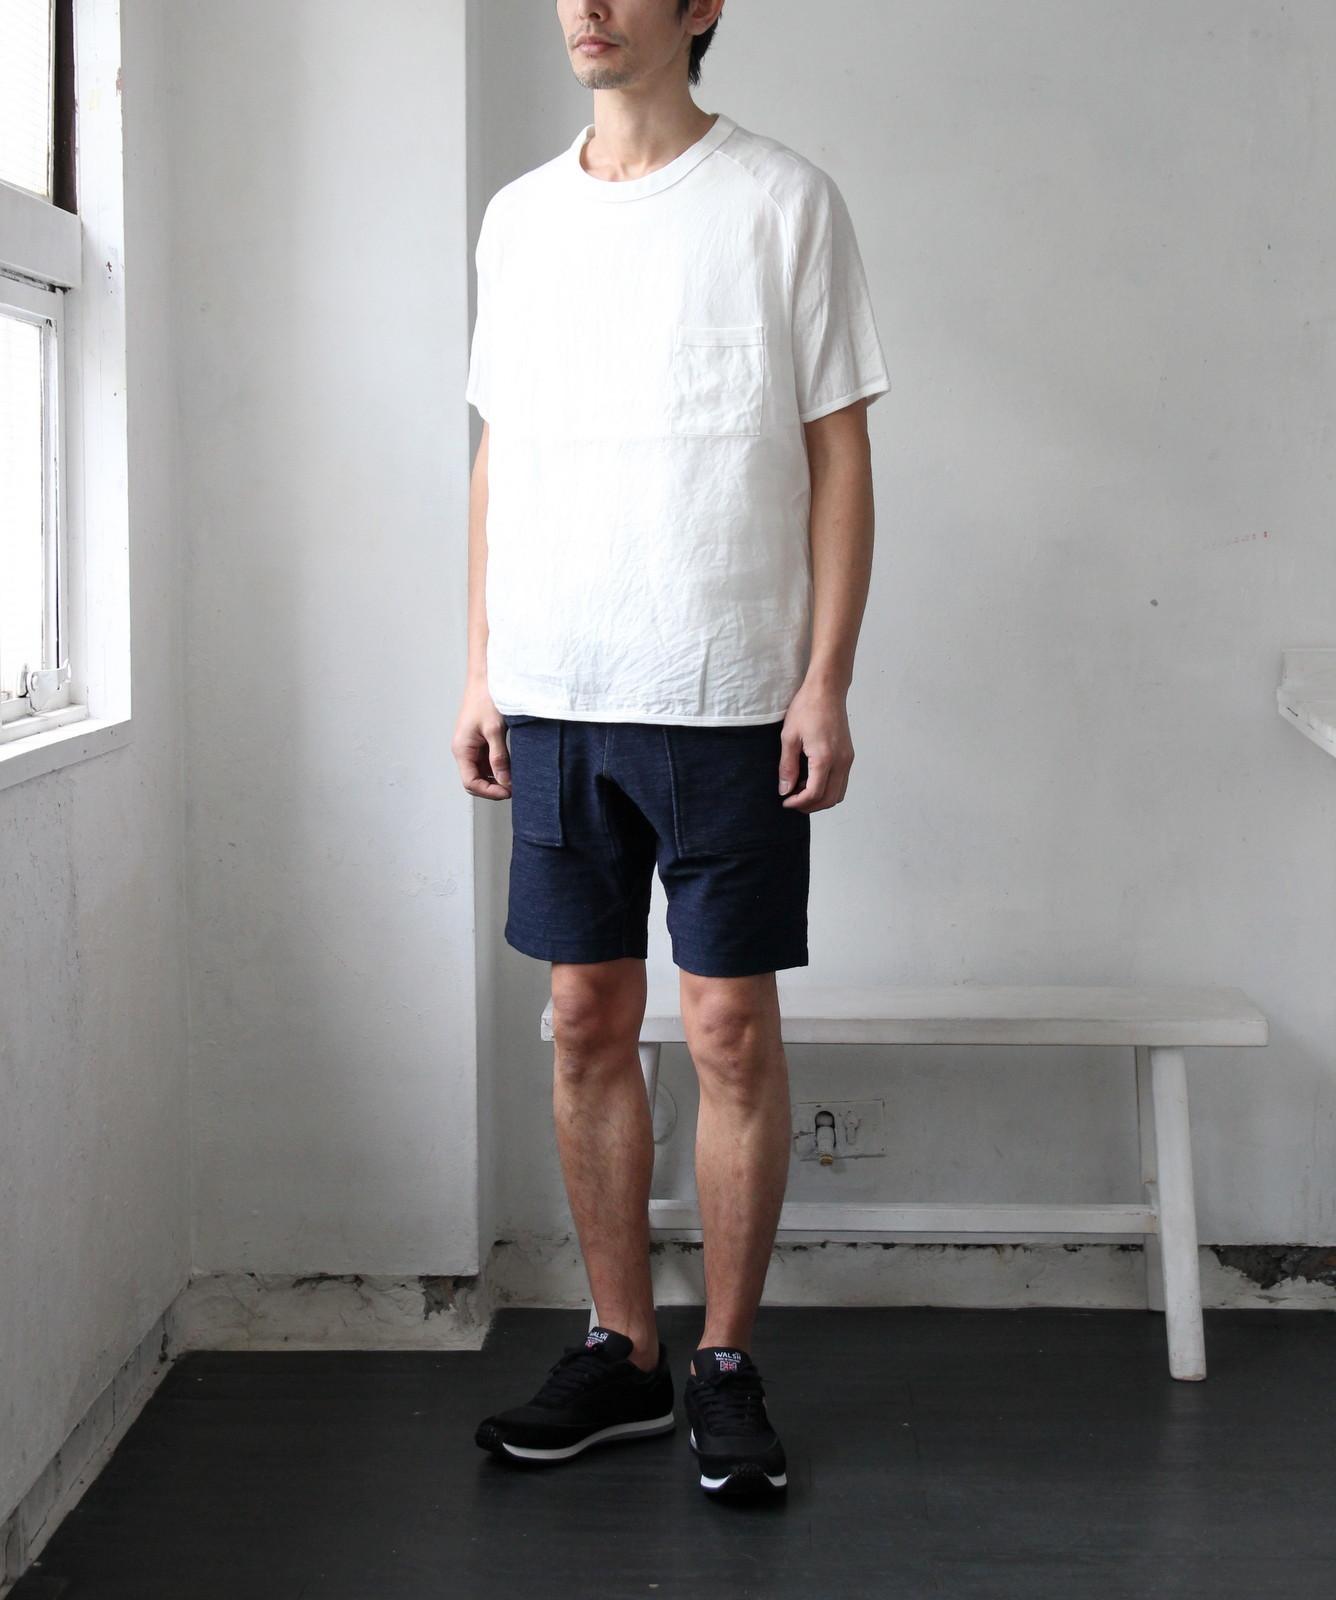 French Linen T-shirt_c0379477_21213474.jpg